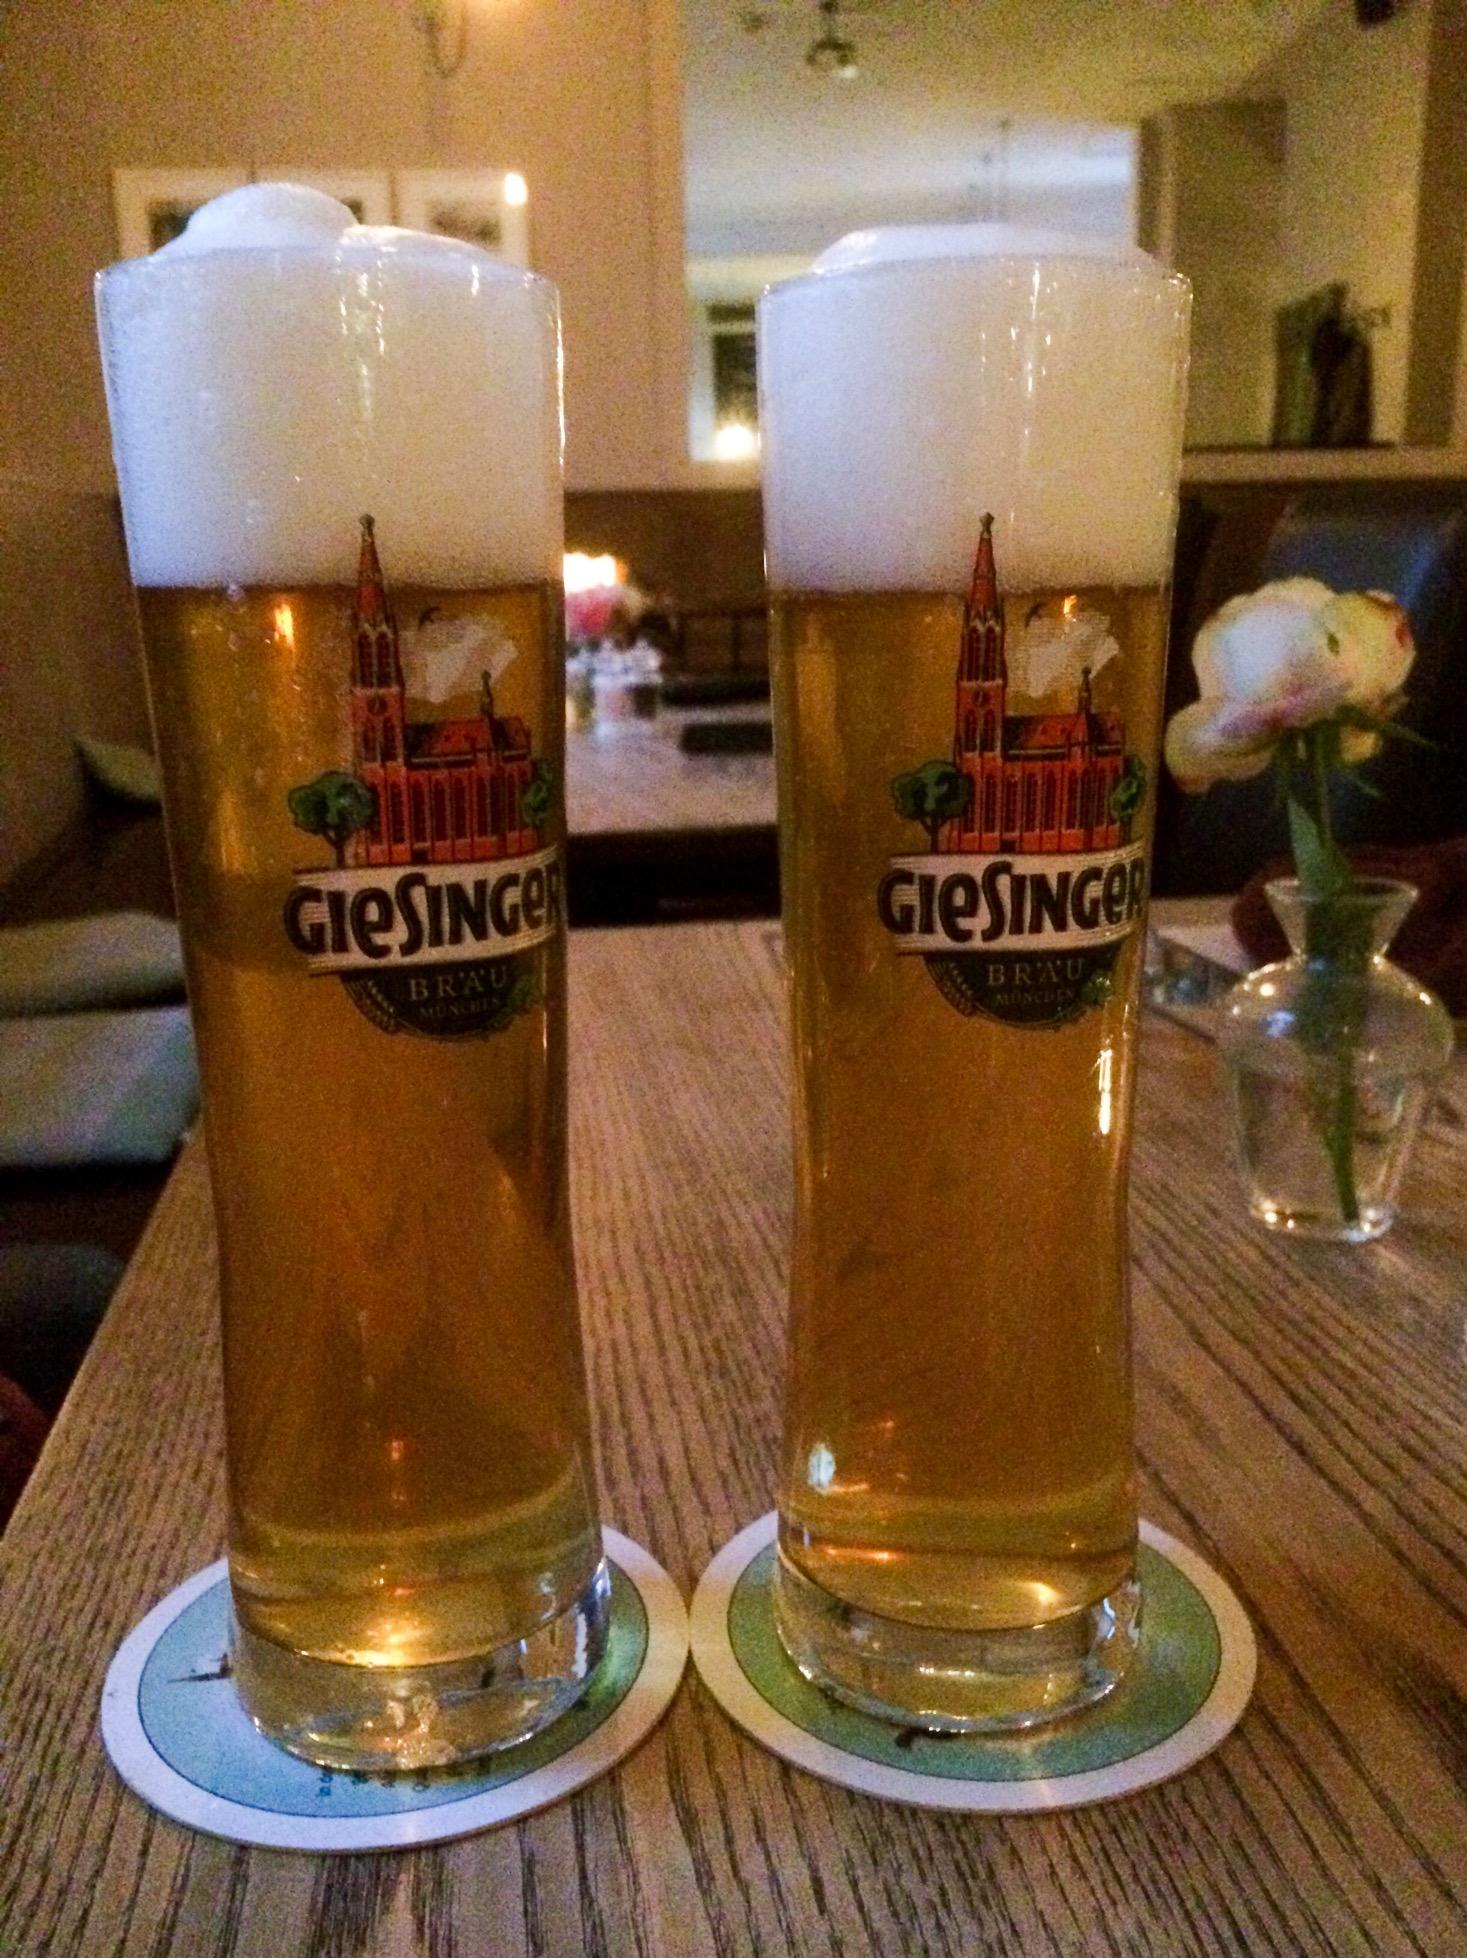 Giesinger beer, Munich, Germany